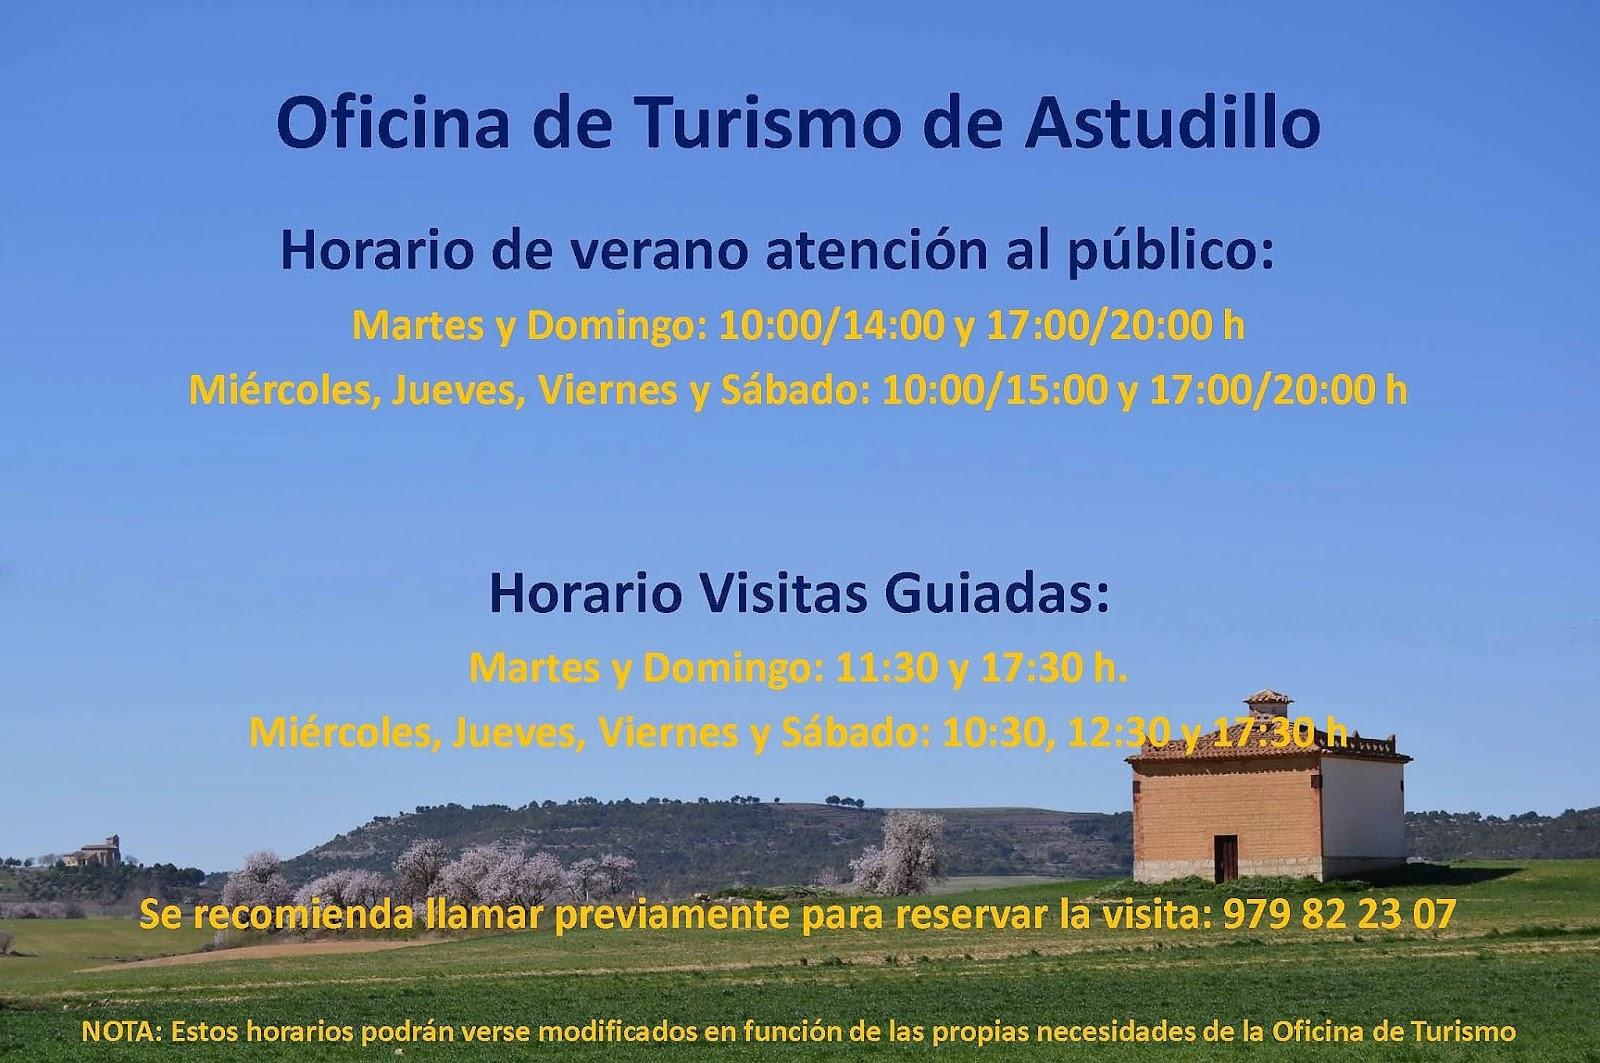 Turismo astudillo horario oficina de turismo verano 2017 for Oficina de turismo de palencia